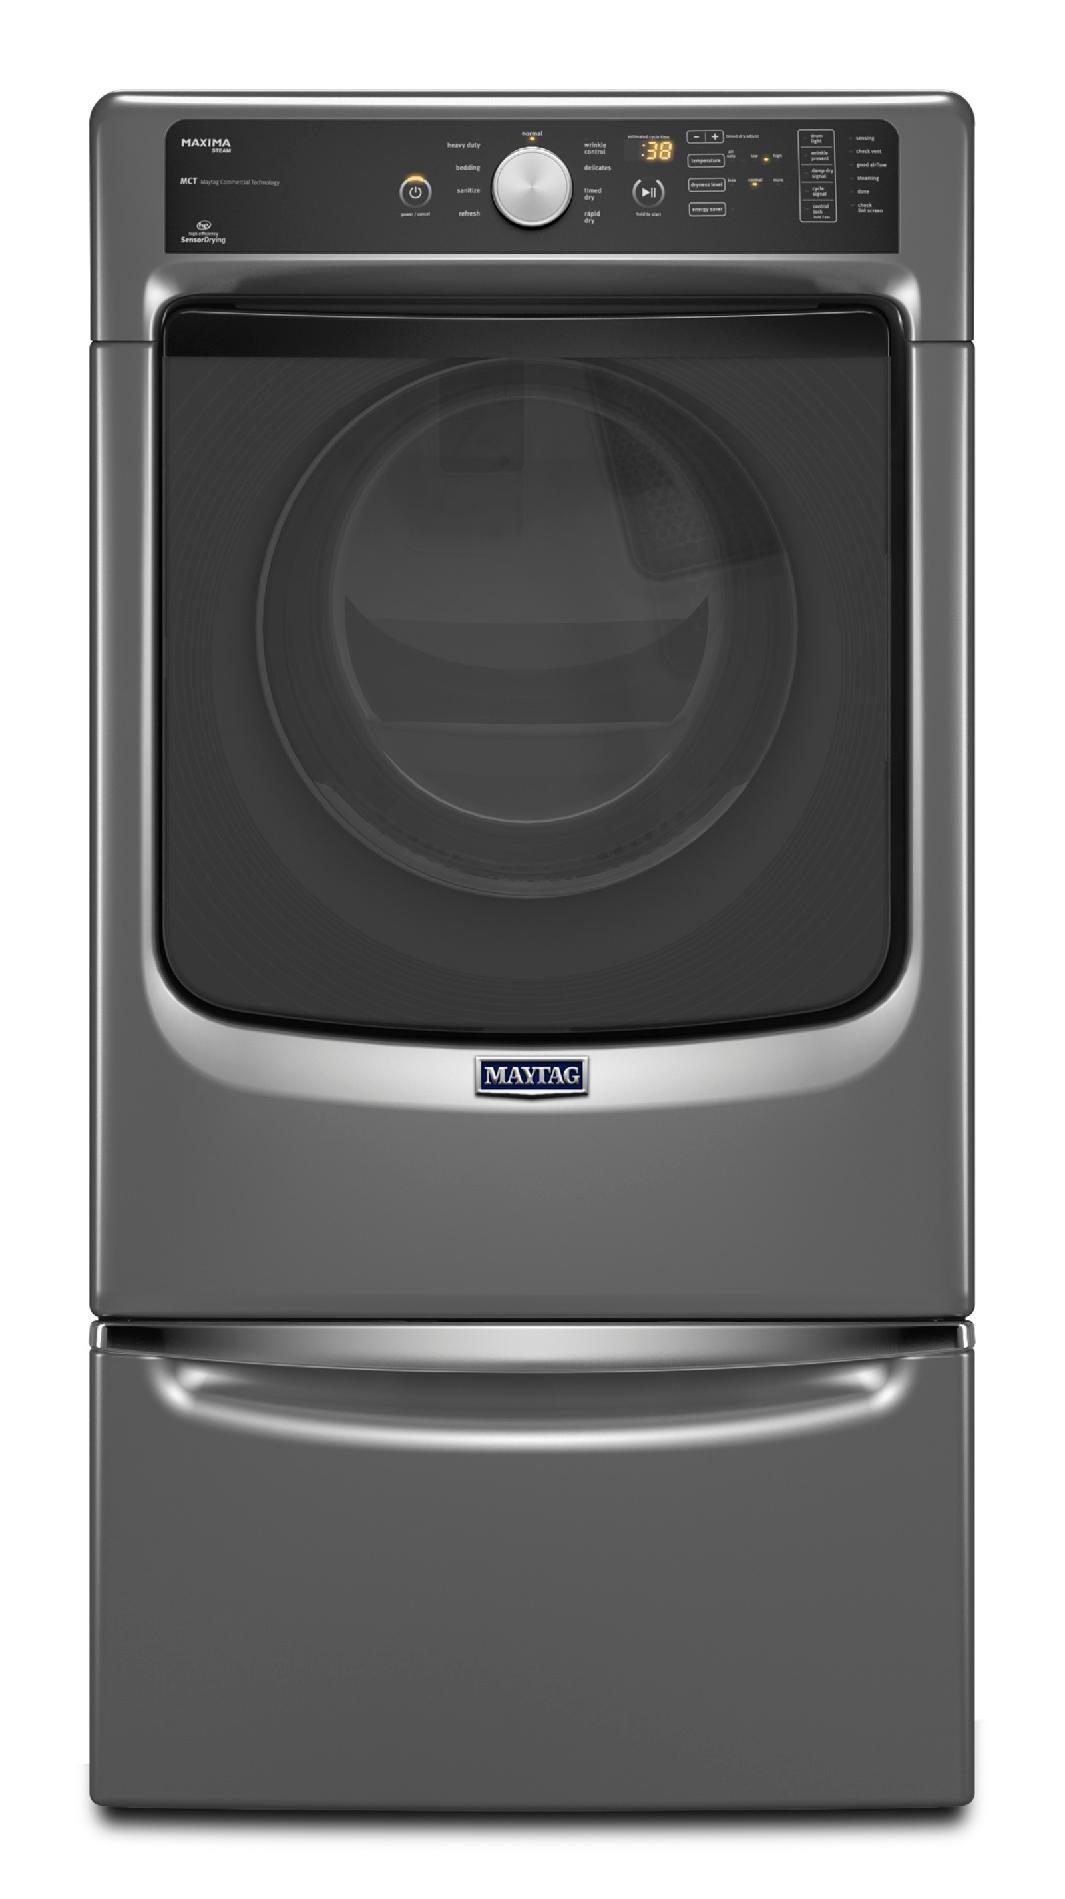 Maytag 7.4 cu. ft. Maxima® Electric Dryer w/ Steam Cycle - Metallic Slate